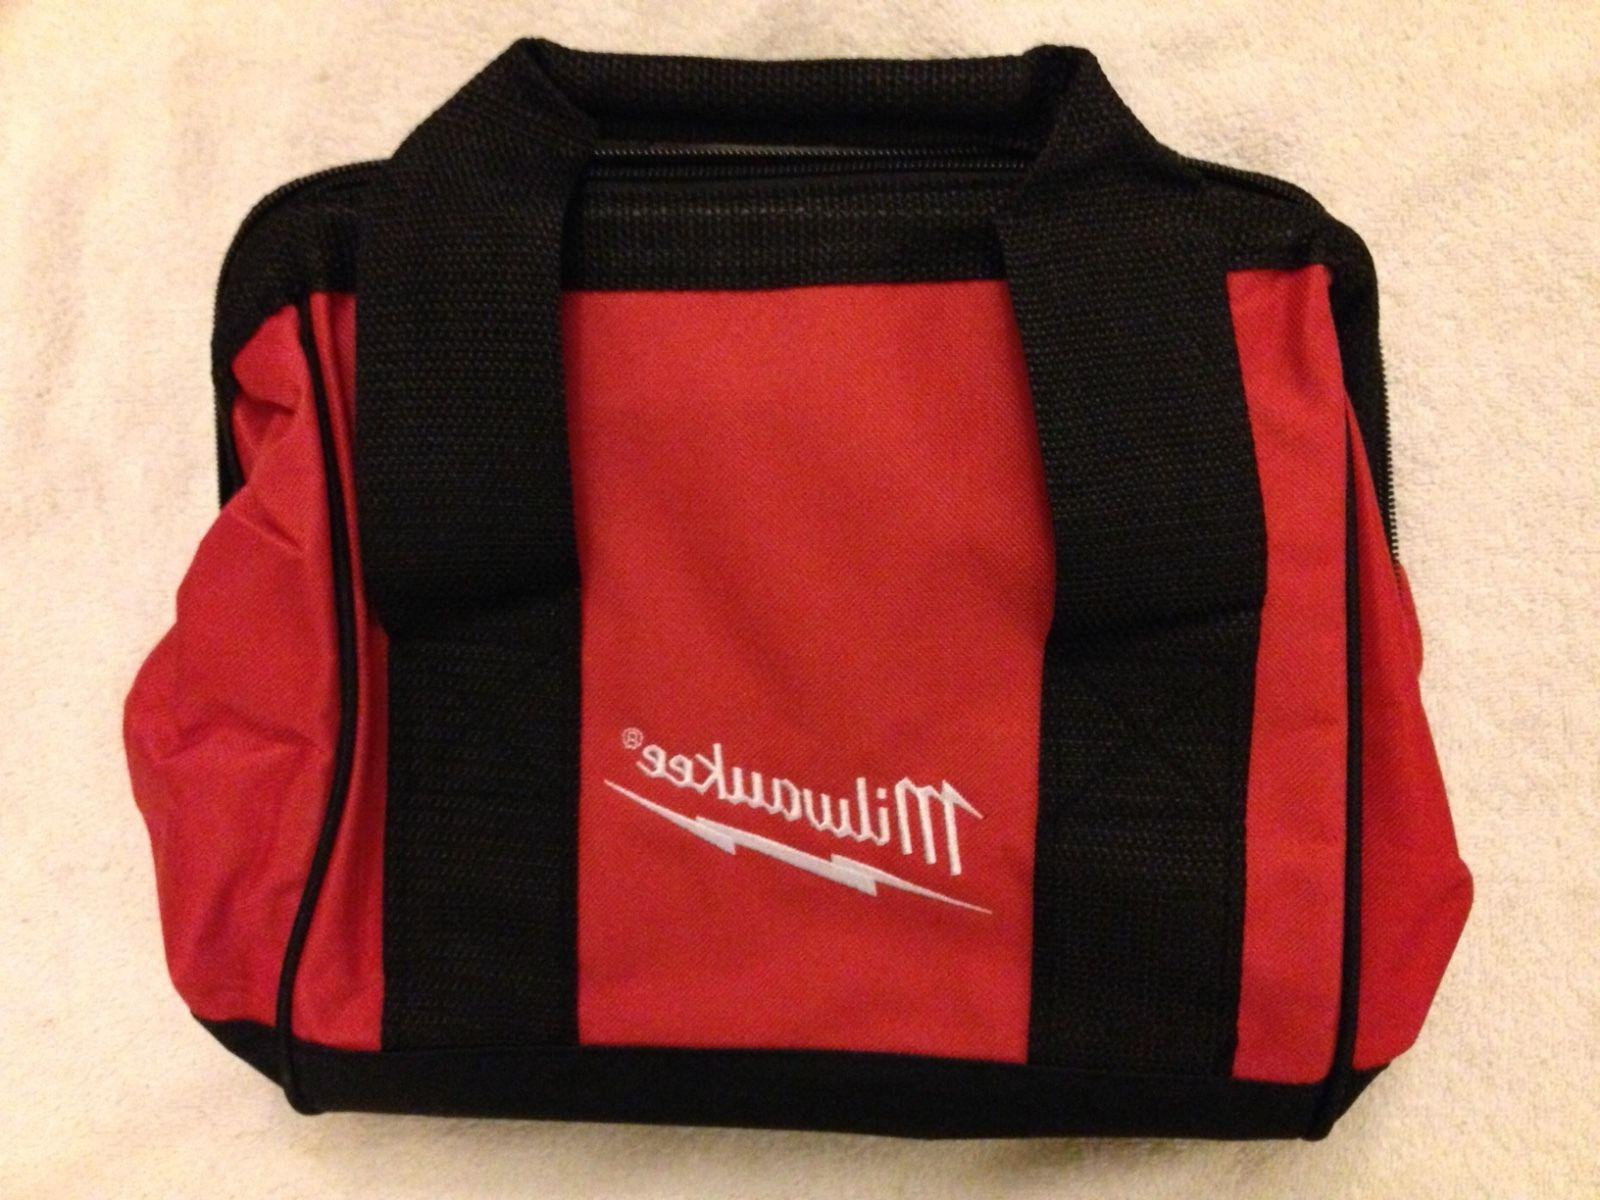 New M12 x Bag